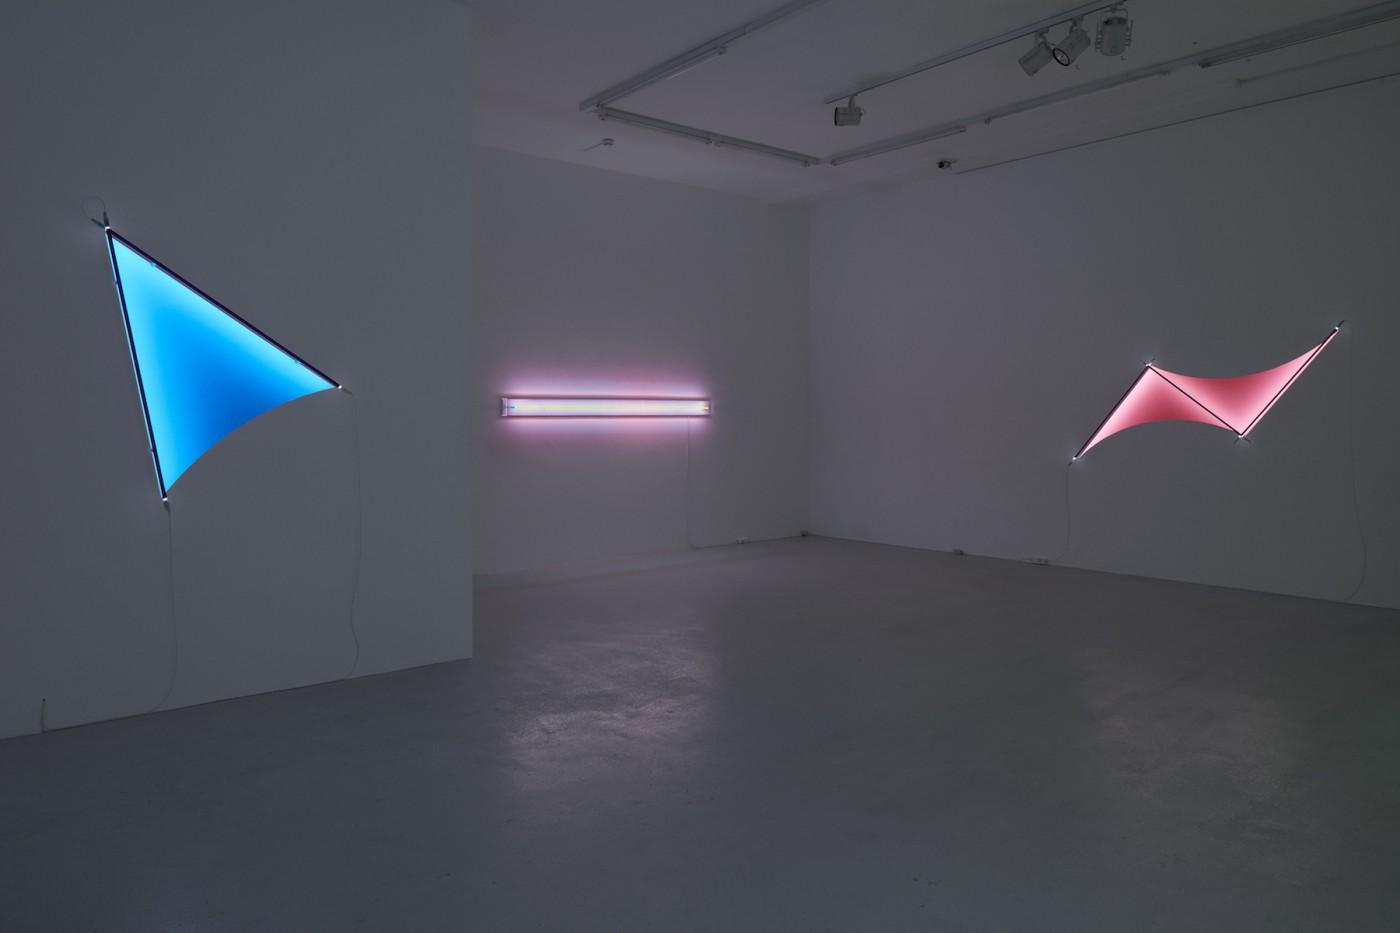 Solo Show - galerie lange + pult, 2017